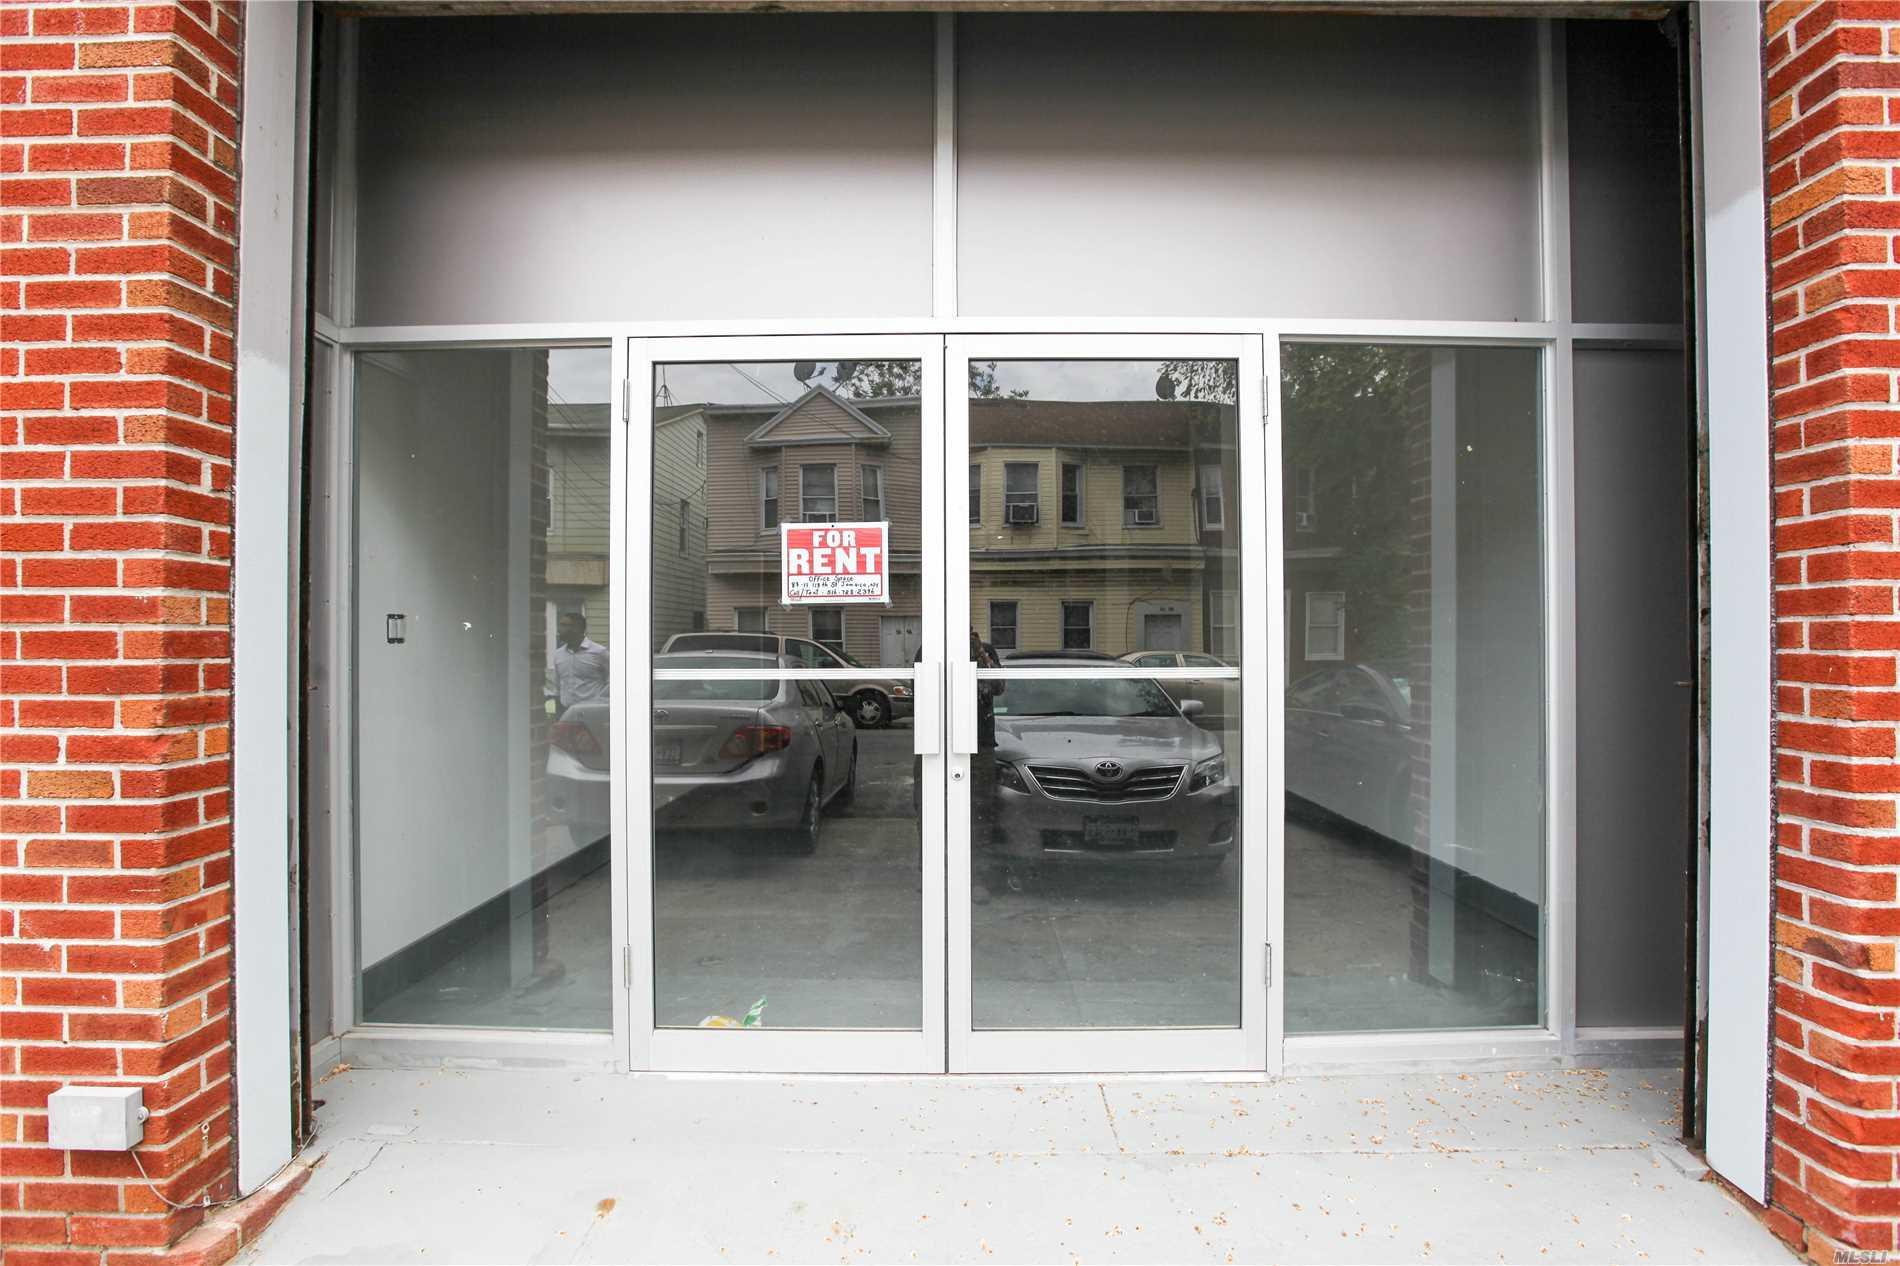 8711 118th St - Richmond Hill, New York